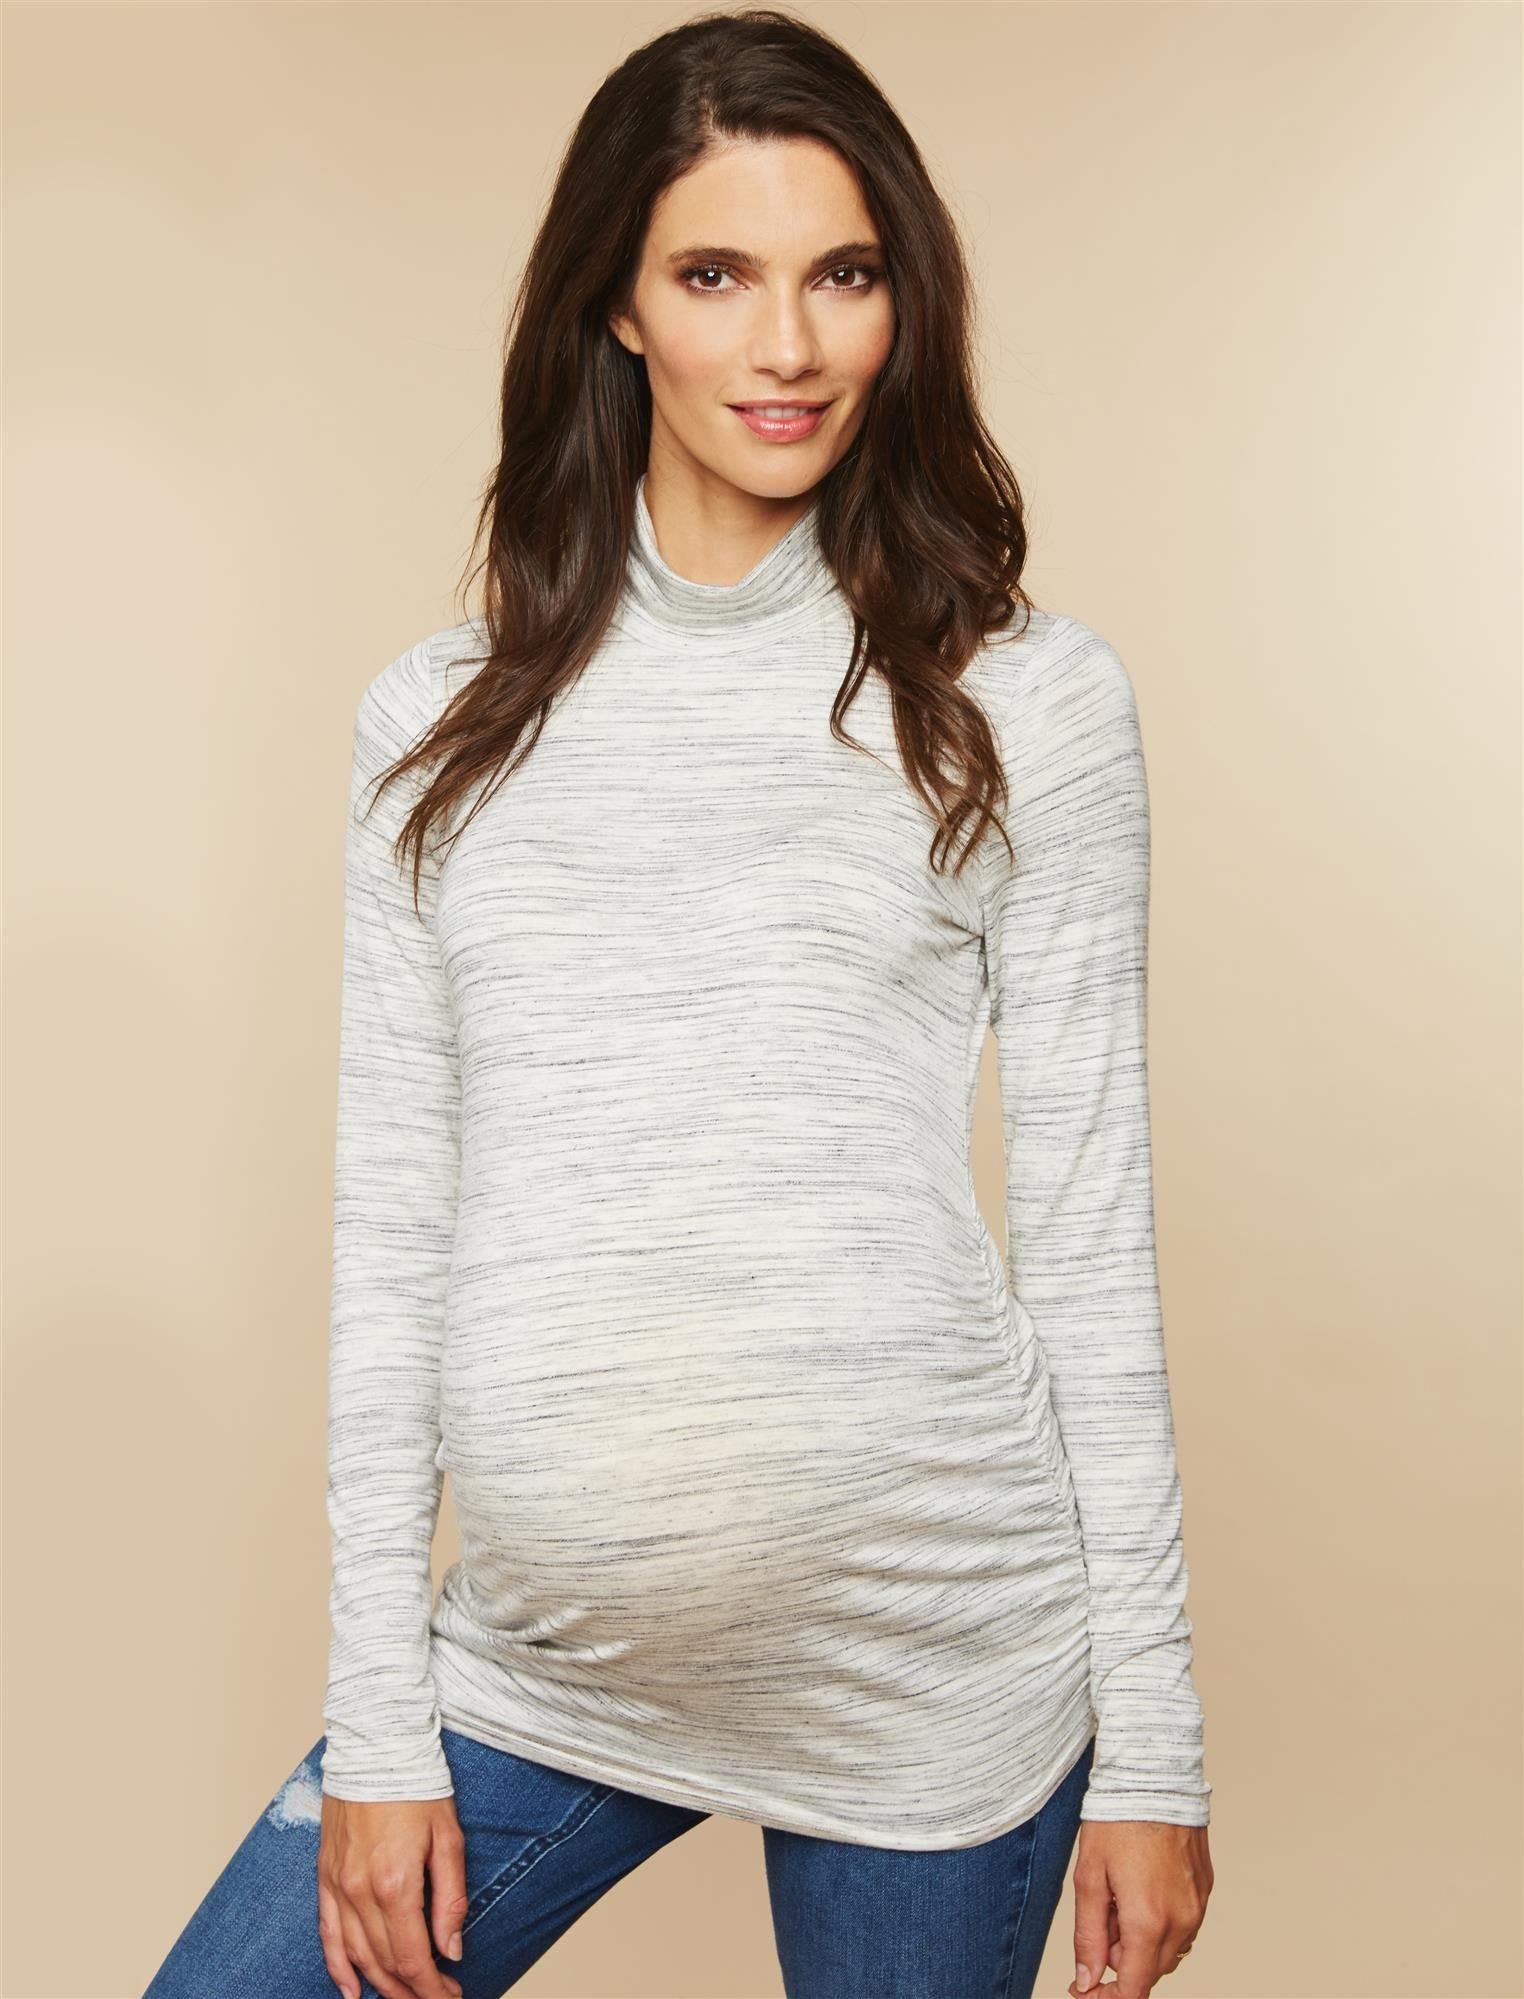 Motherhood Maternity Women's Maternity Long Sleeve Side Ruche Turtleneck Knit Top, Grey Space Dye, Medium by Motherhood Maternity (Image #3)